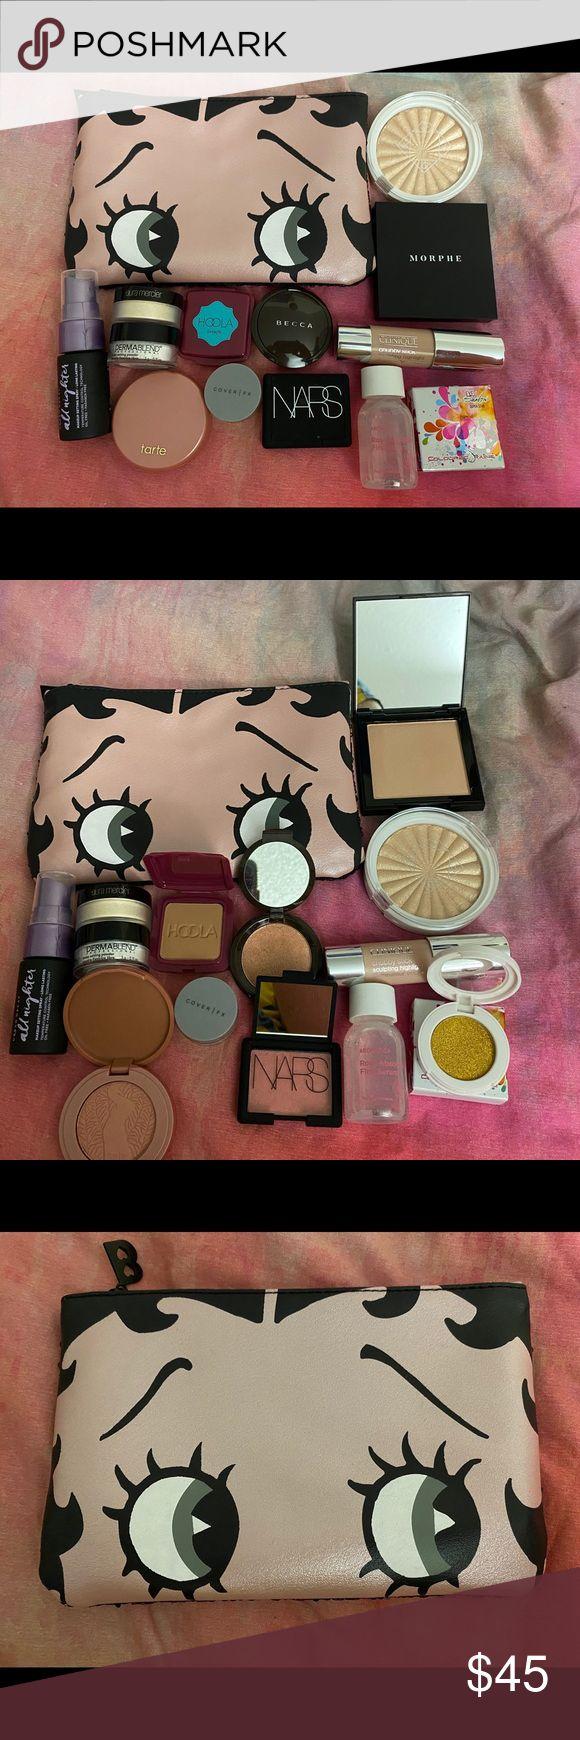 Makeup bundle and bag Ipsy Betty boop bag Urban decay all